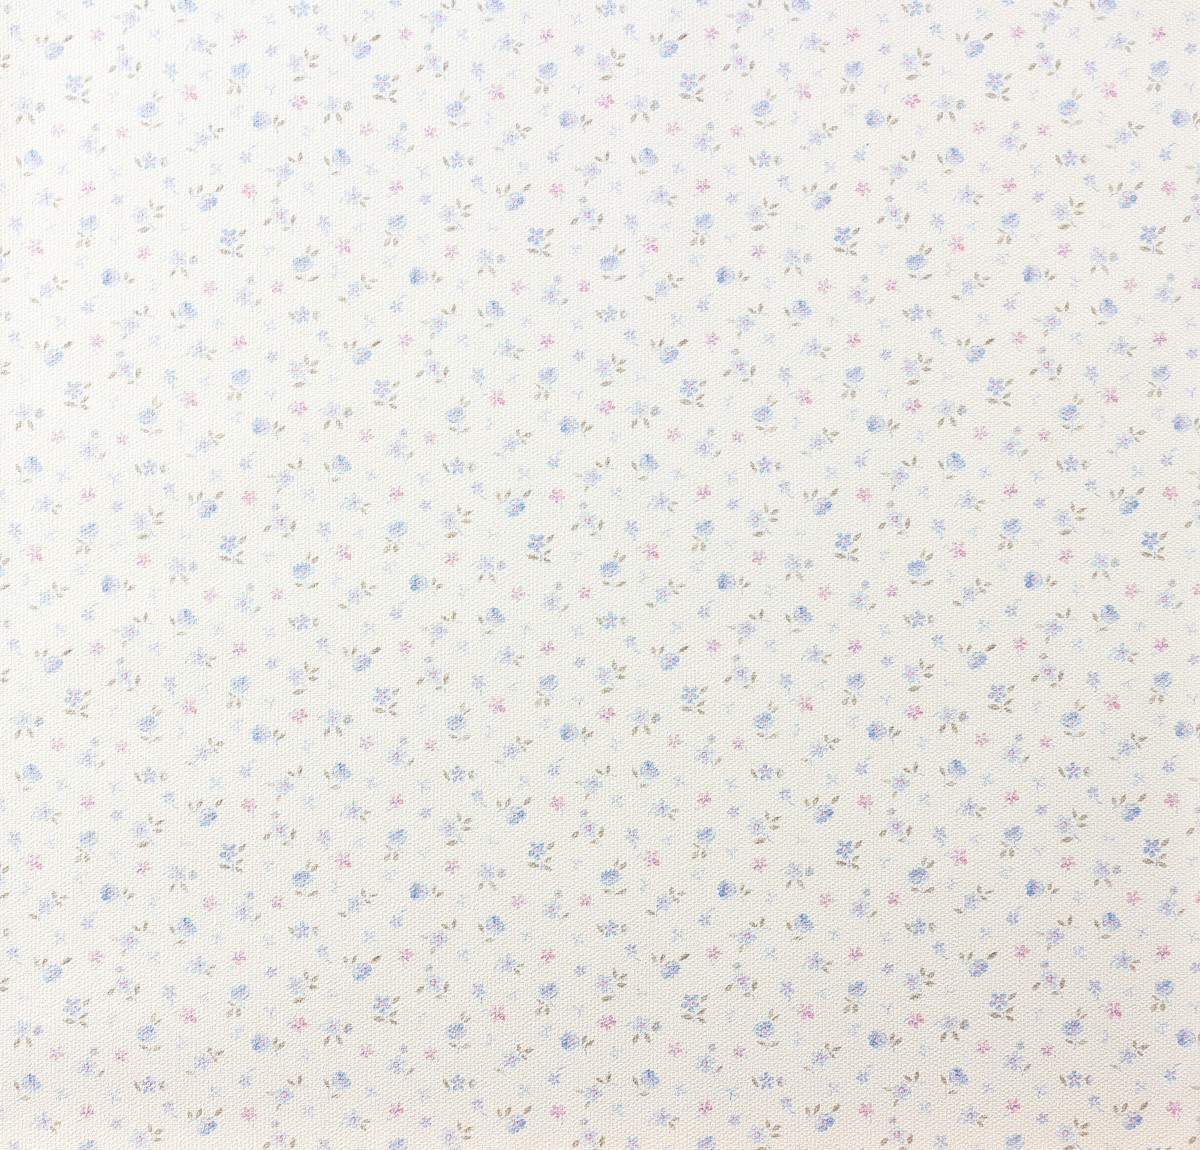 landhaus tapete fleuri pastel a s 93768 3 937683 bl mchen. Black Bedroom Furniture Sets. Home Design Ideas